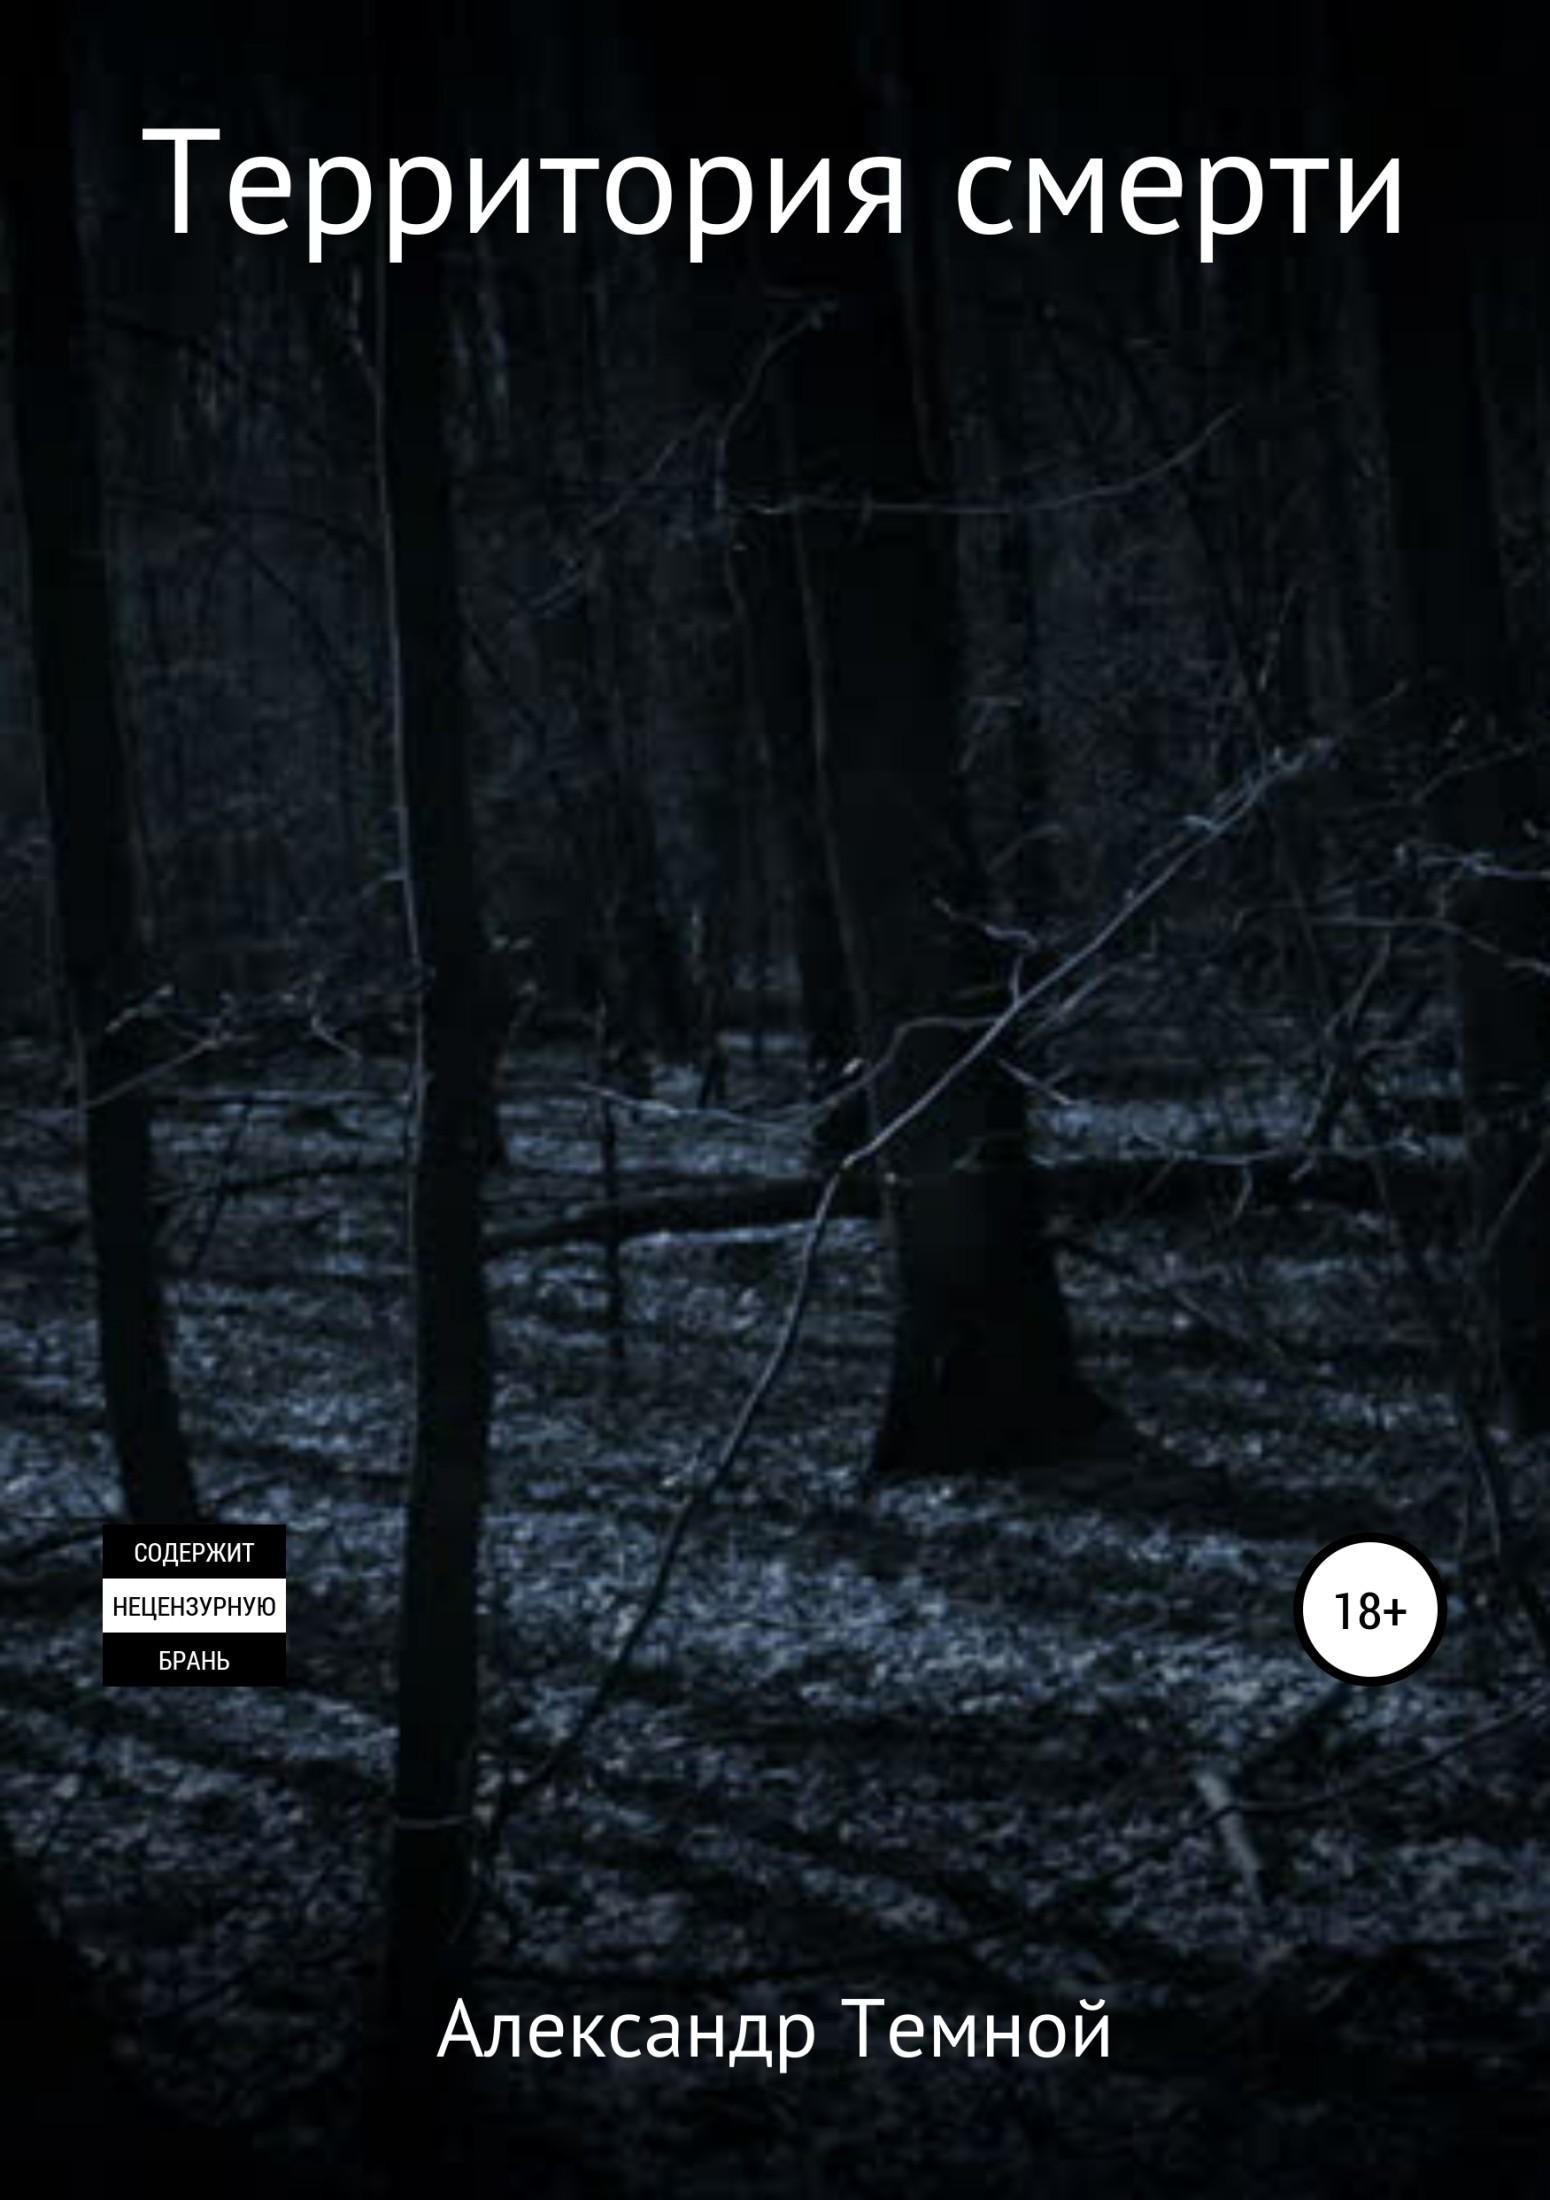 все цены на Александр Валерьевич Темной Территория смерти онлайн